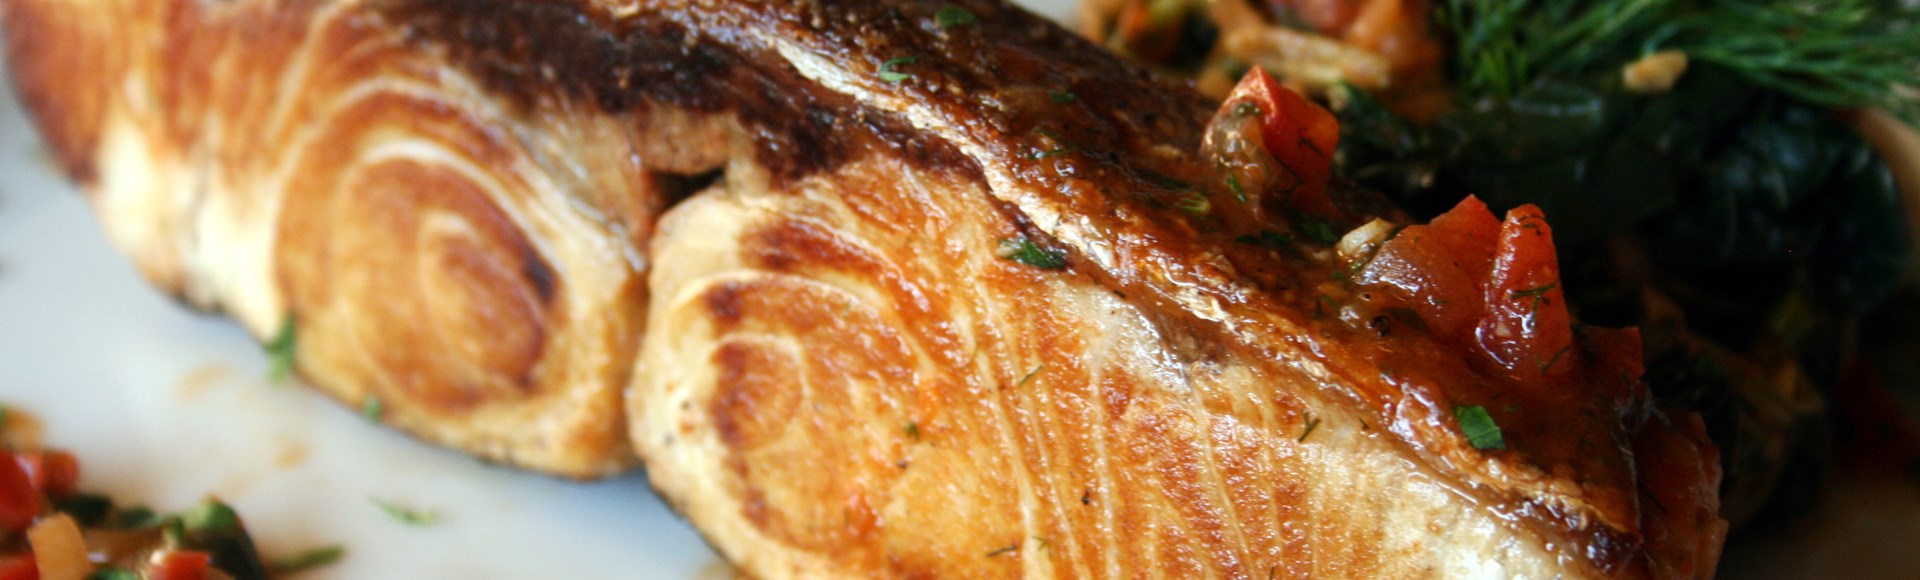 antonis-stavros-chania-crete-greece-17 - Chef Antonis & Stavros - Chania, Kreta, Hellas - Alargo | Håndplukkede ferieboliger på Kreta, Korfu og Paros